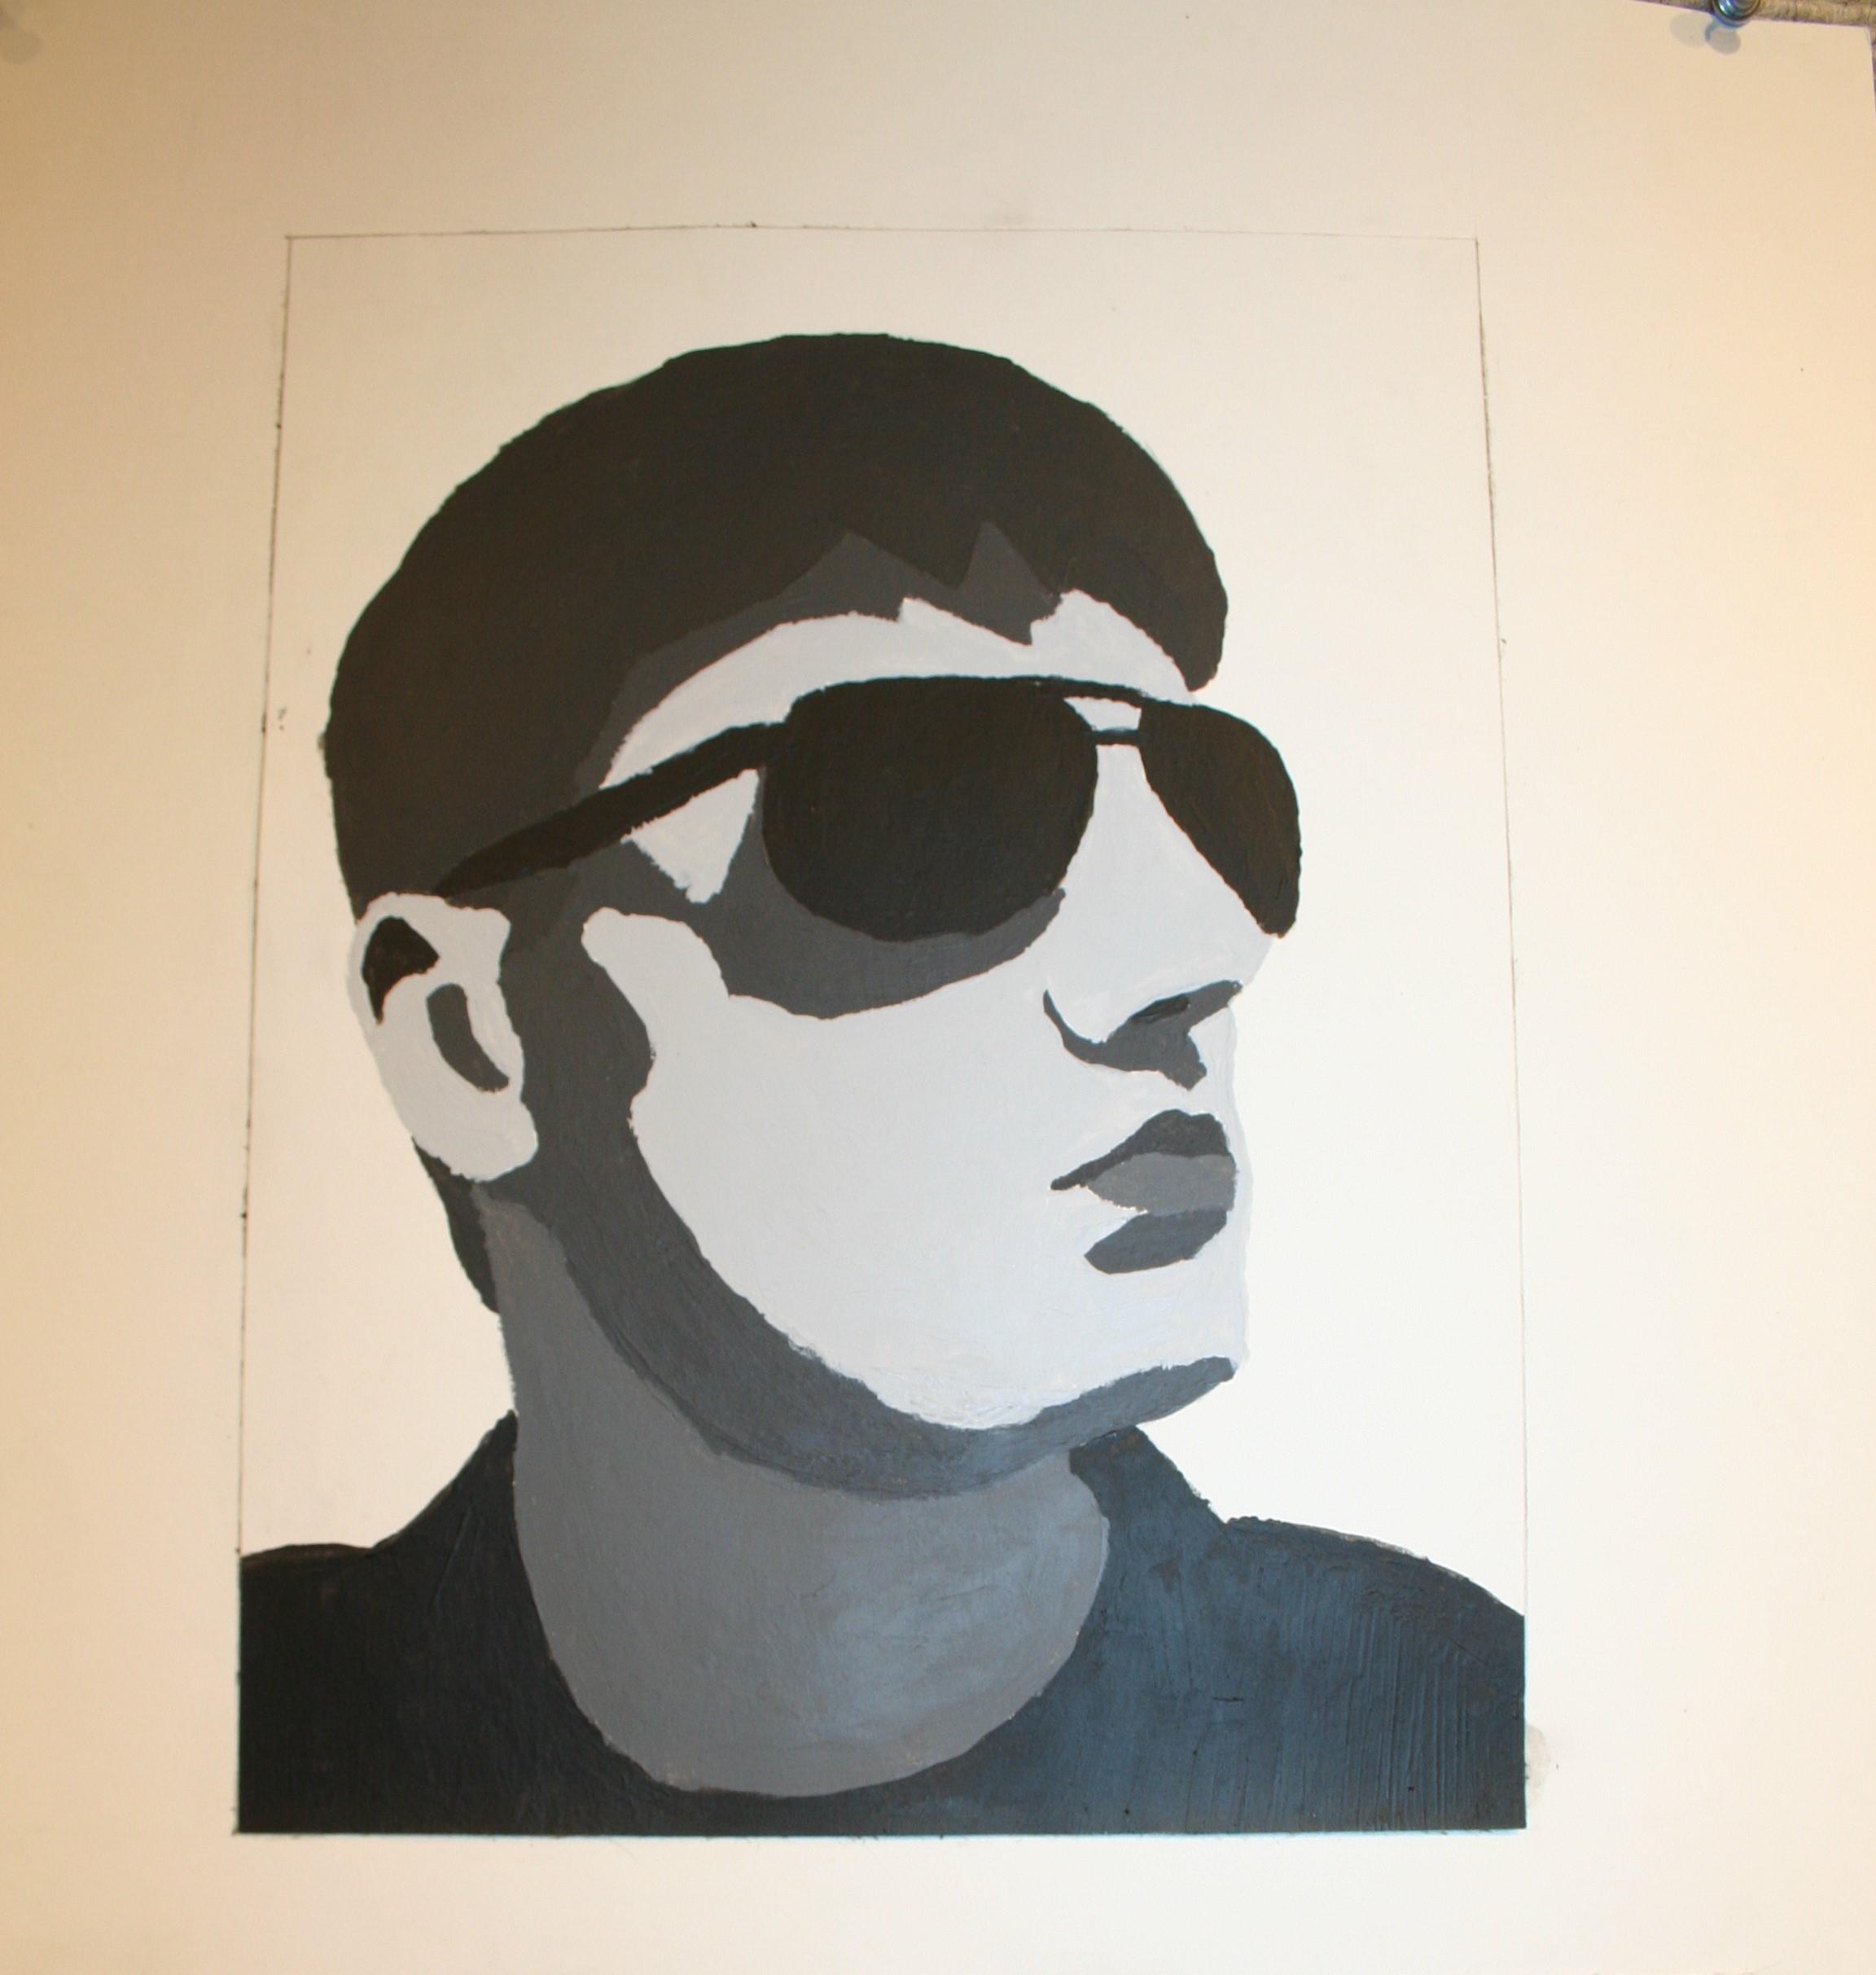 Image of a man wearing sunglasses